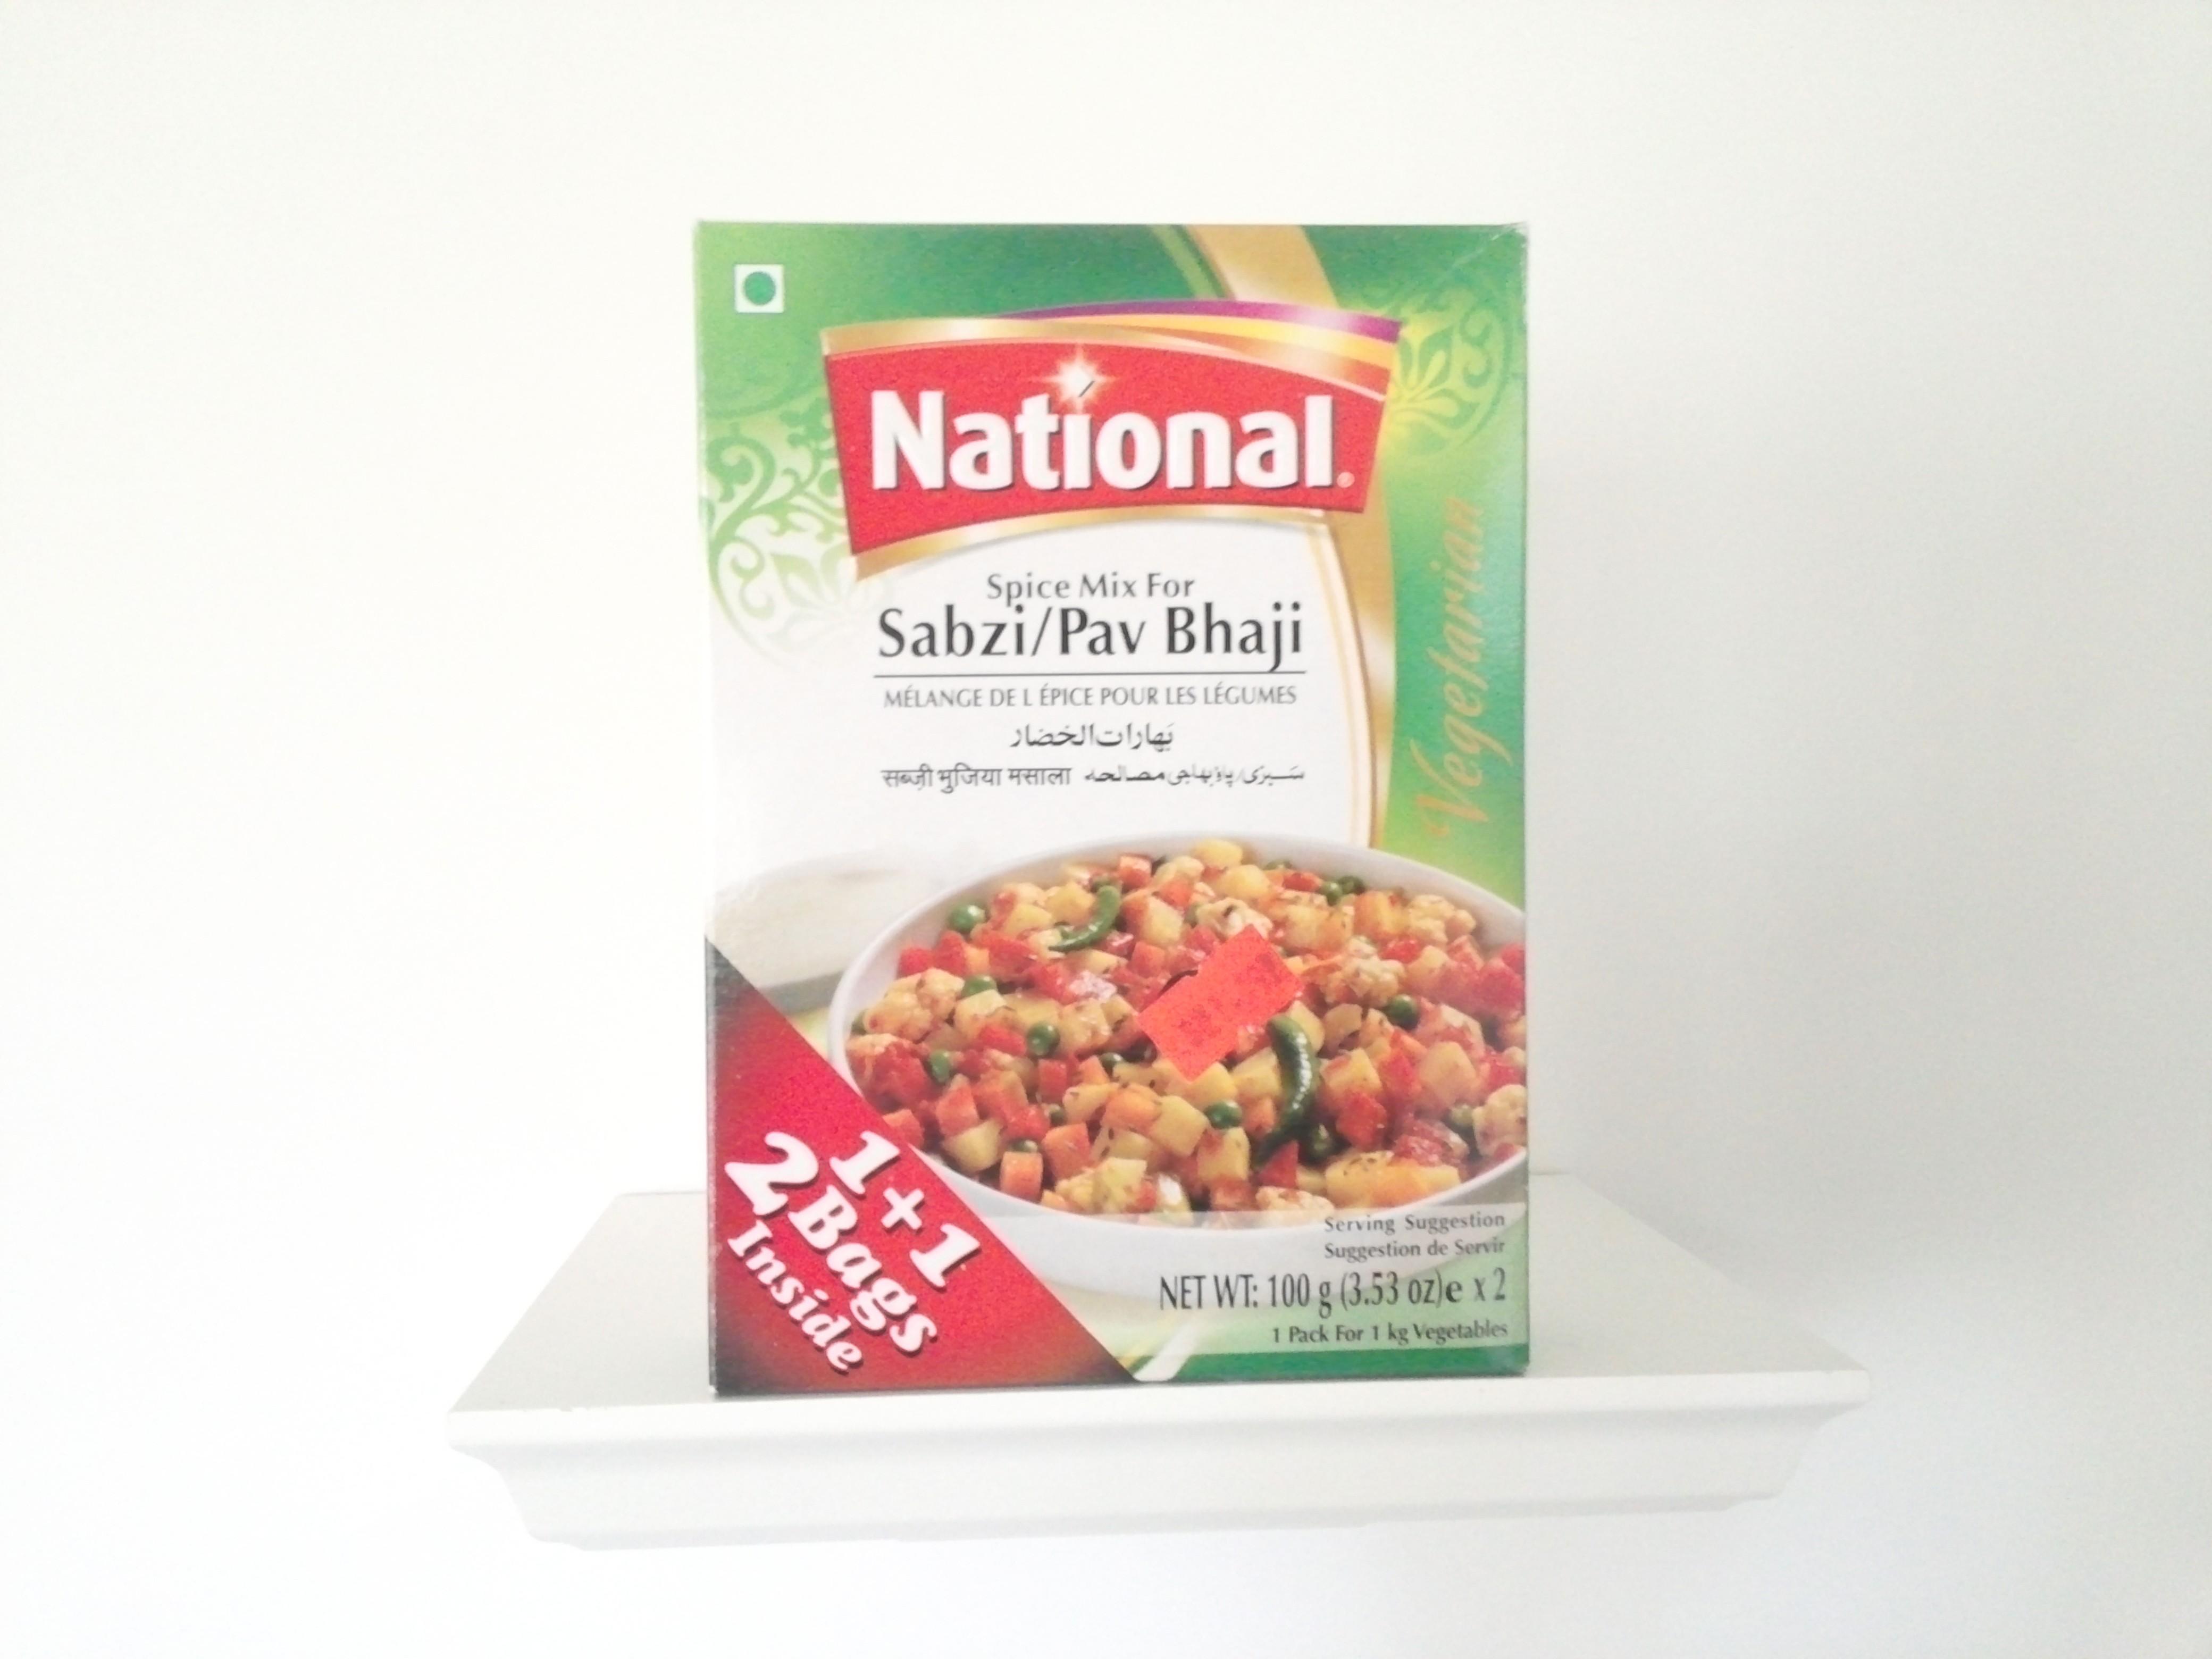 National Sabzi/Pav Bhaji Spice Mix 200 grm